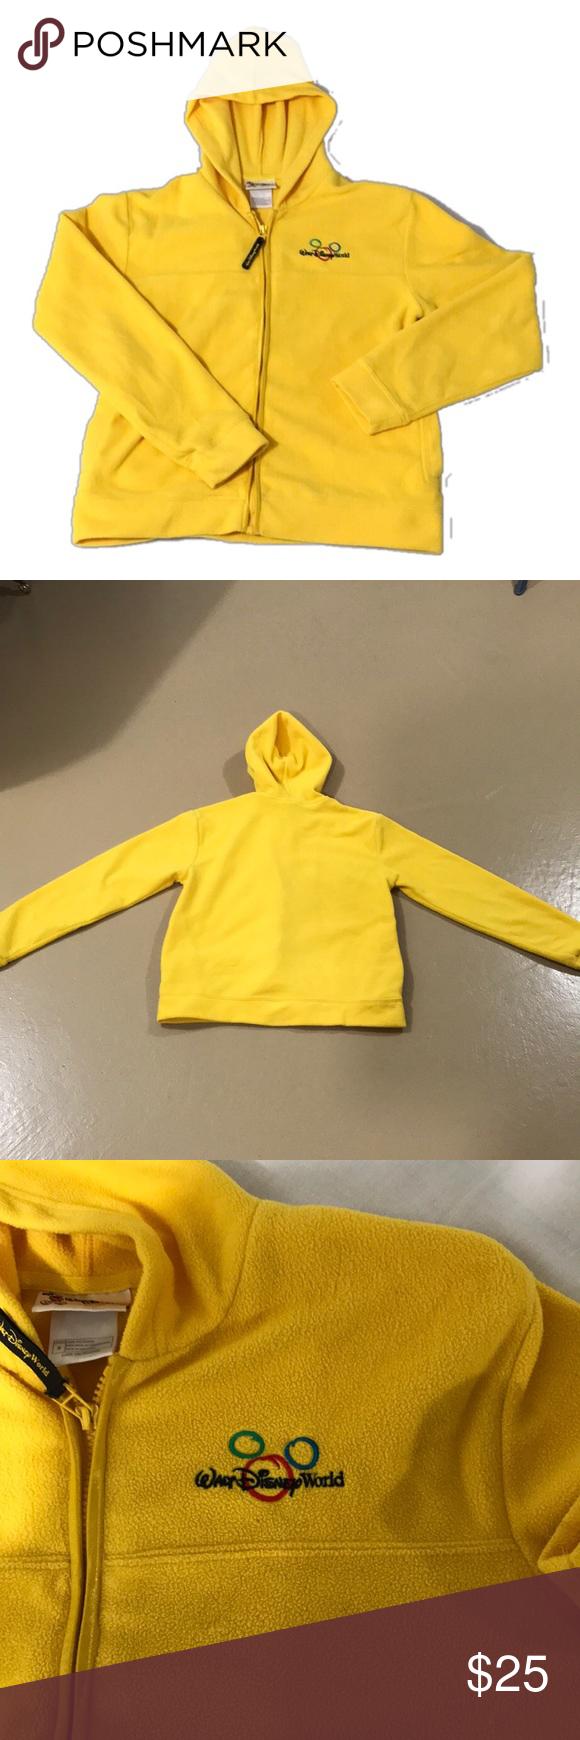 Disney World ZipUp Yellow Fleece Jacket size S Zip Conditioning